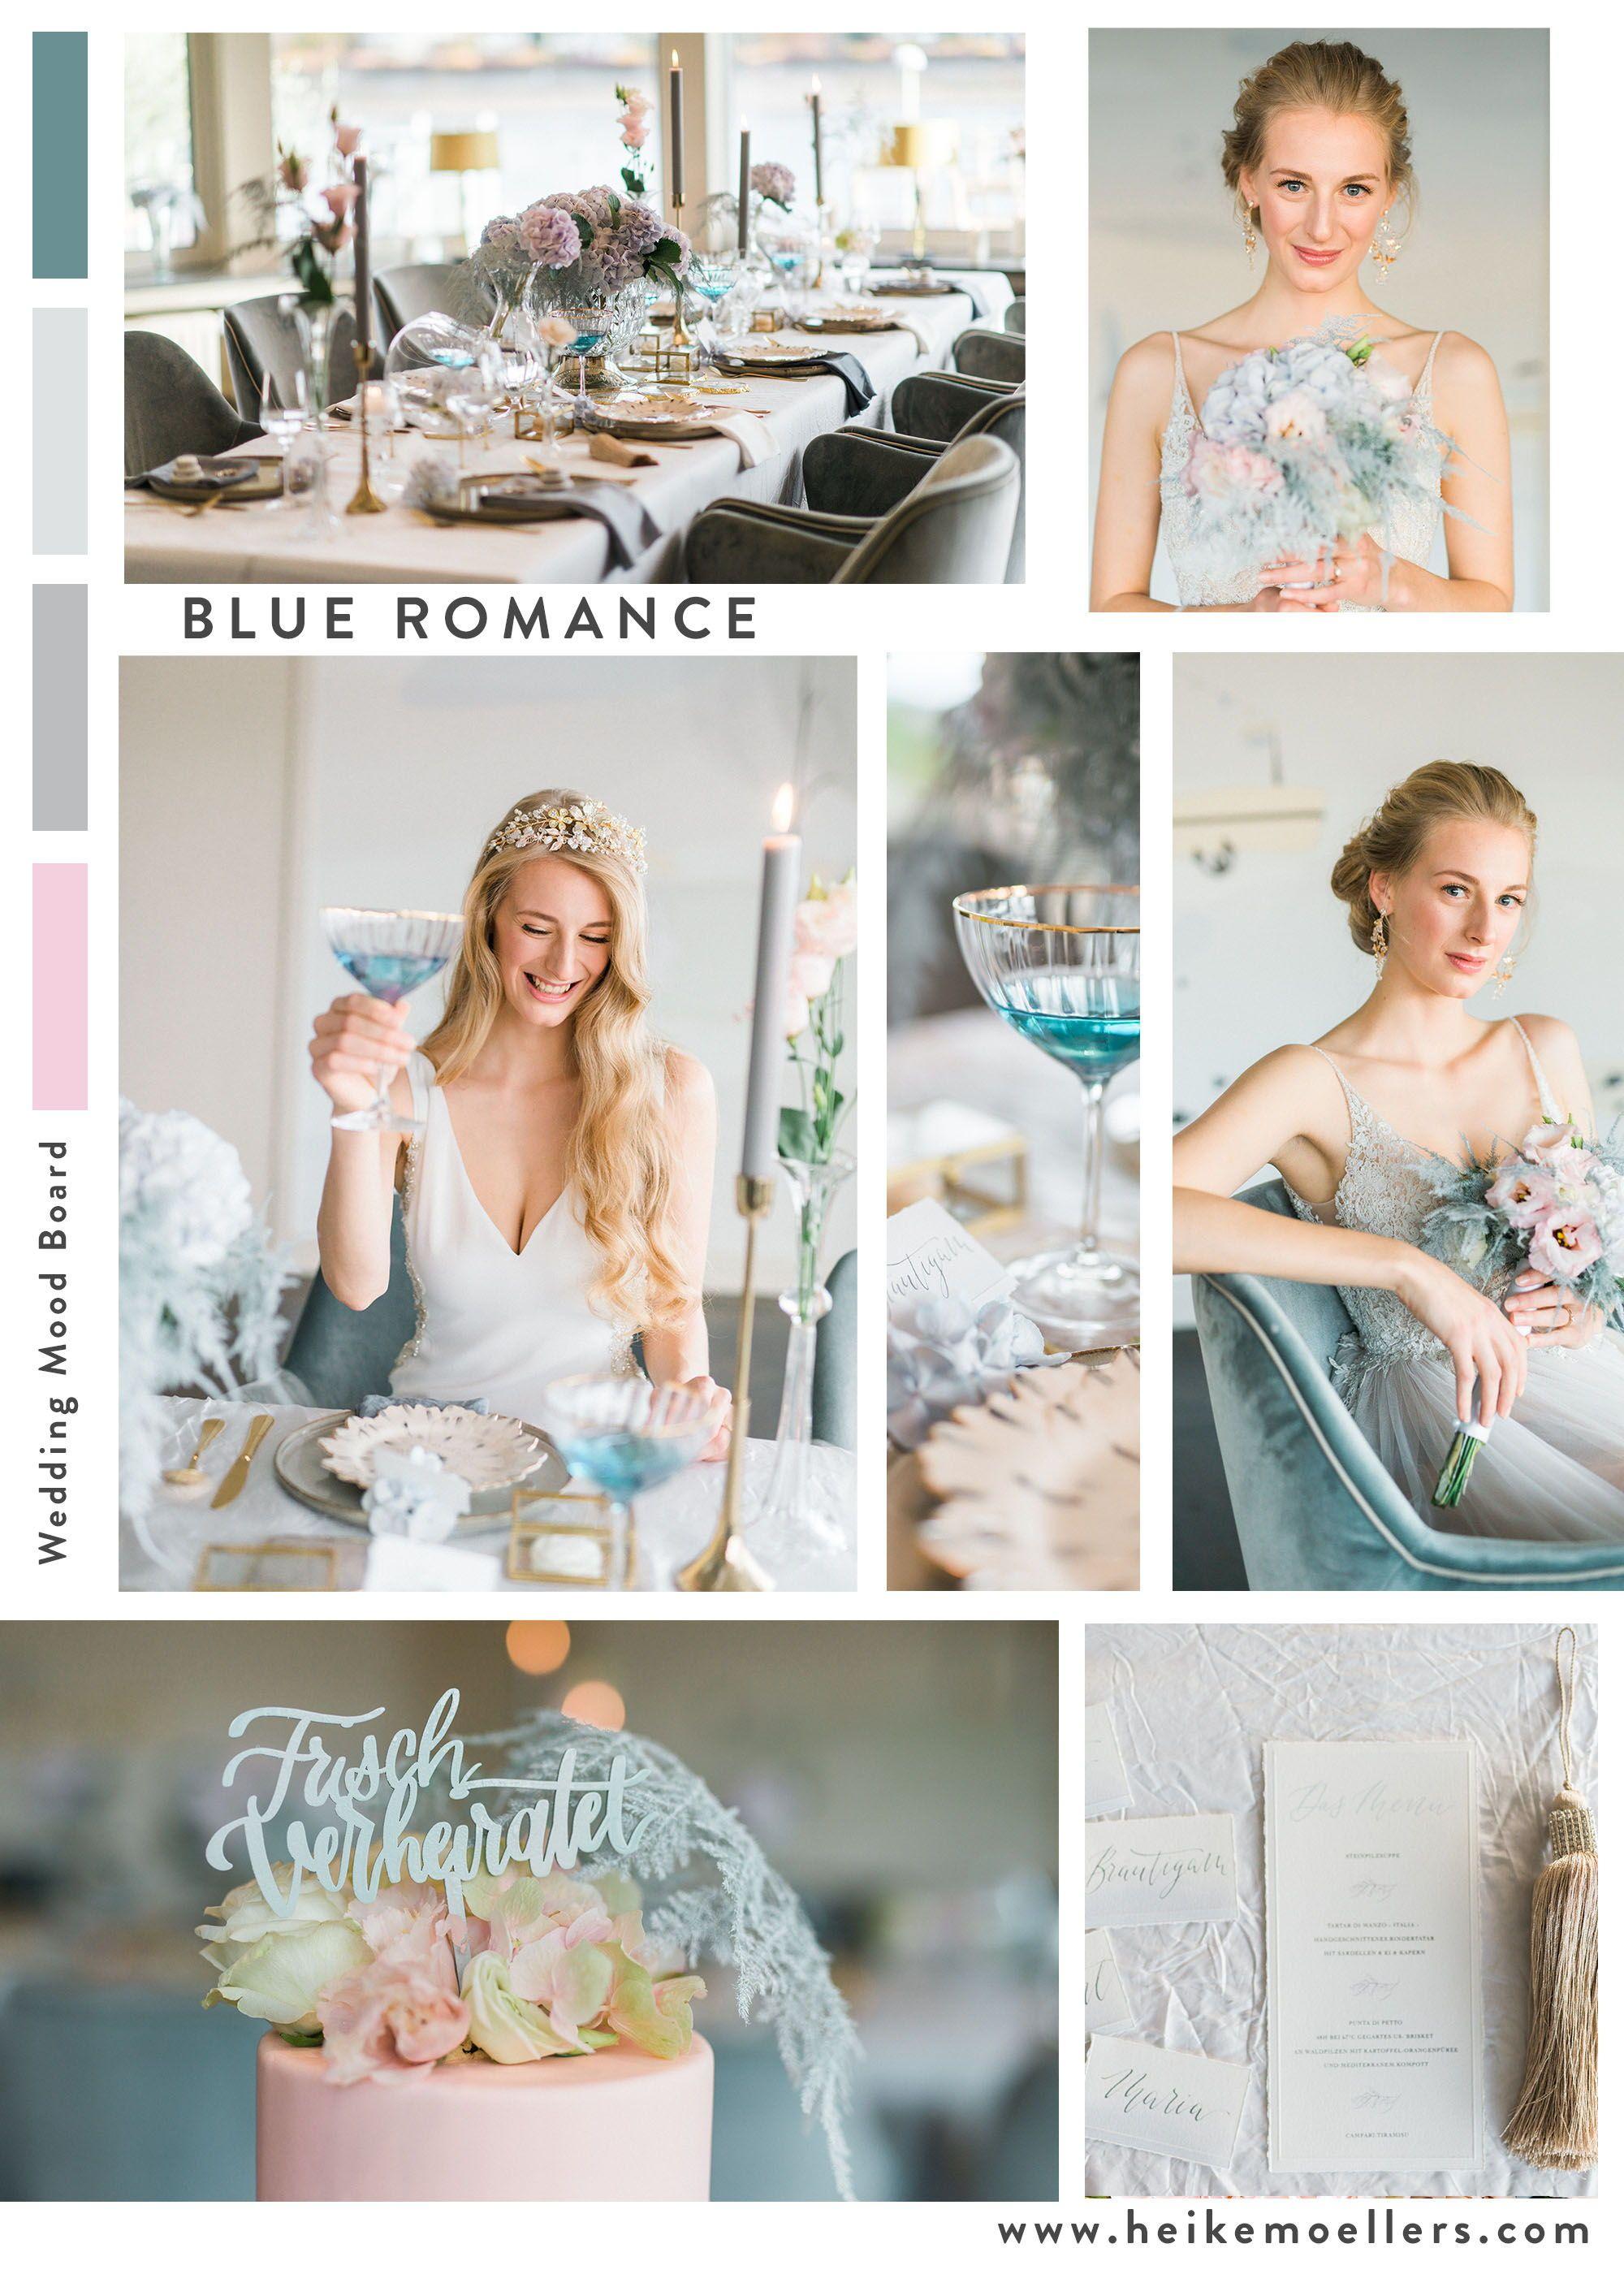 Wedding Romance in blue